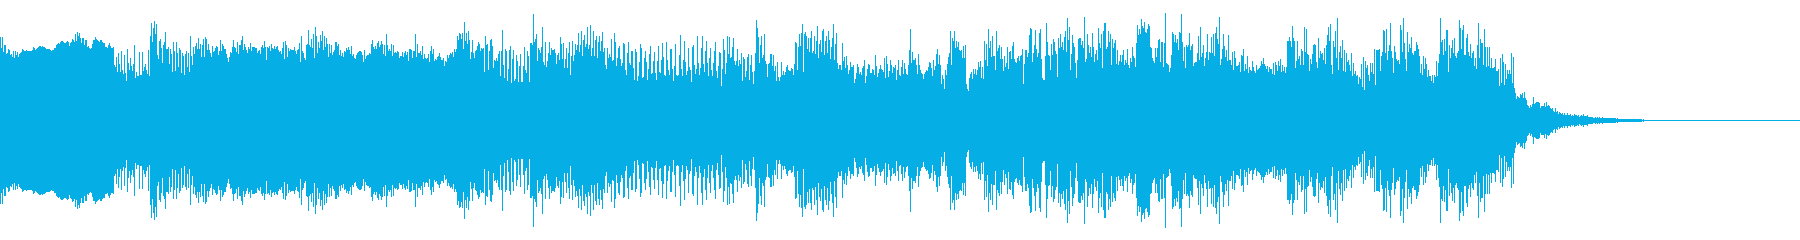 8bit エンディング系のジングルの再生済みの波形